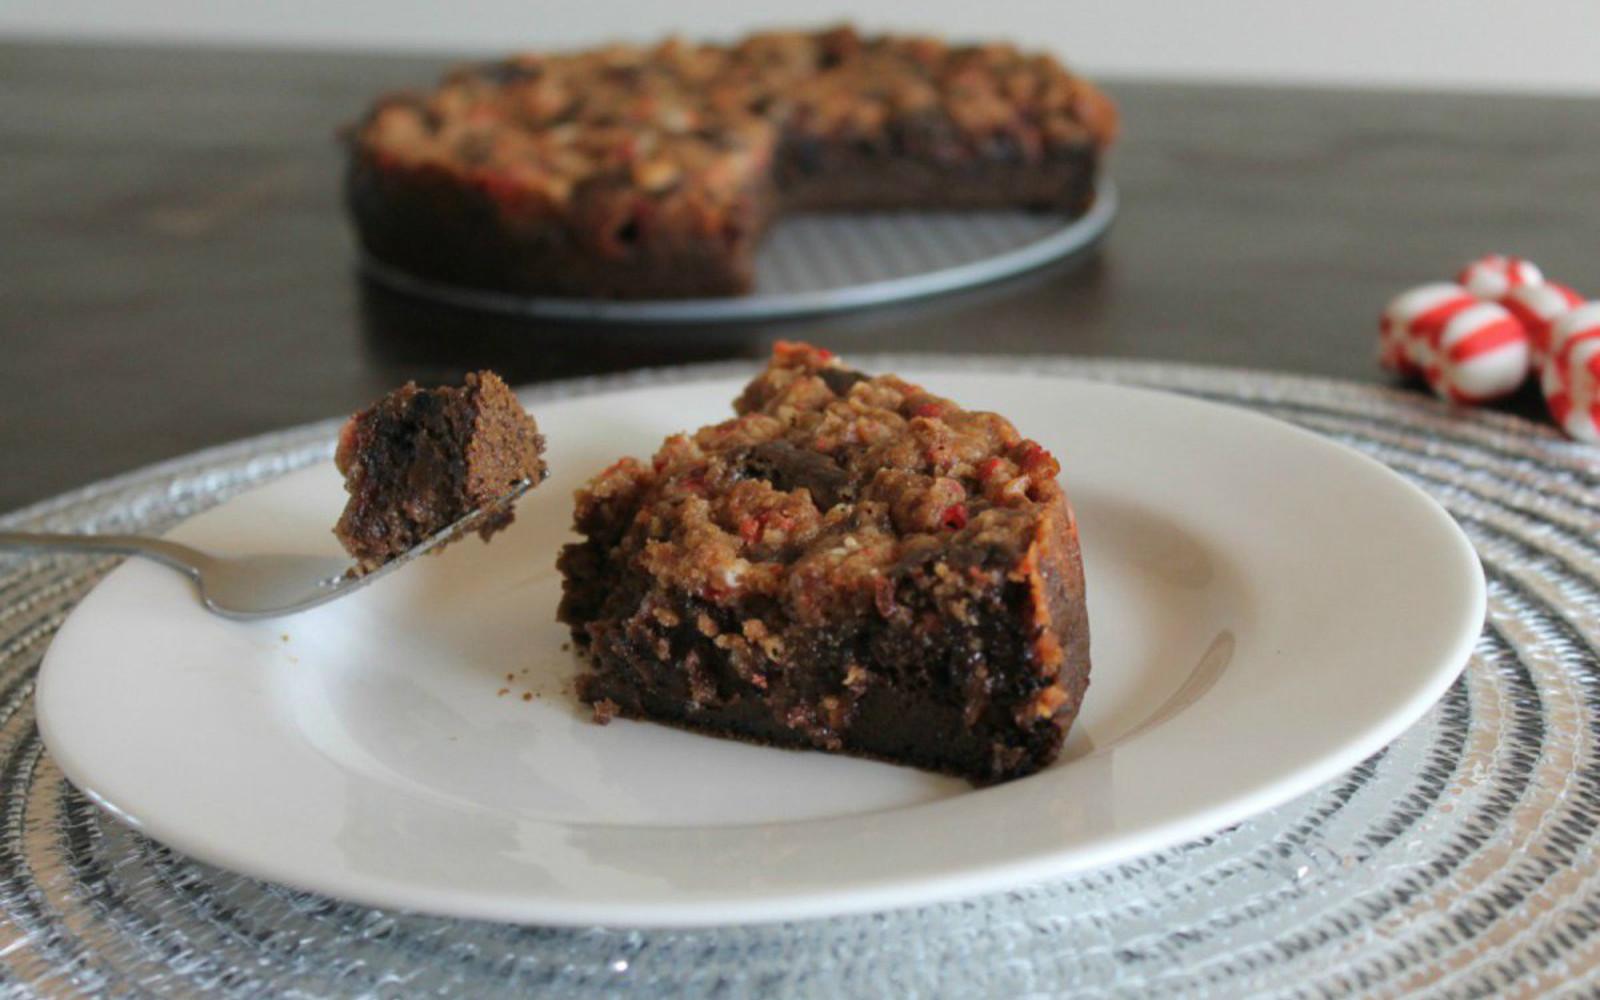 Slice of vegan peppermint mocha crumb cake